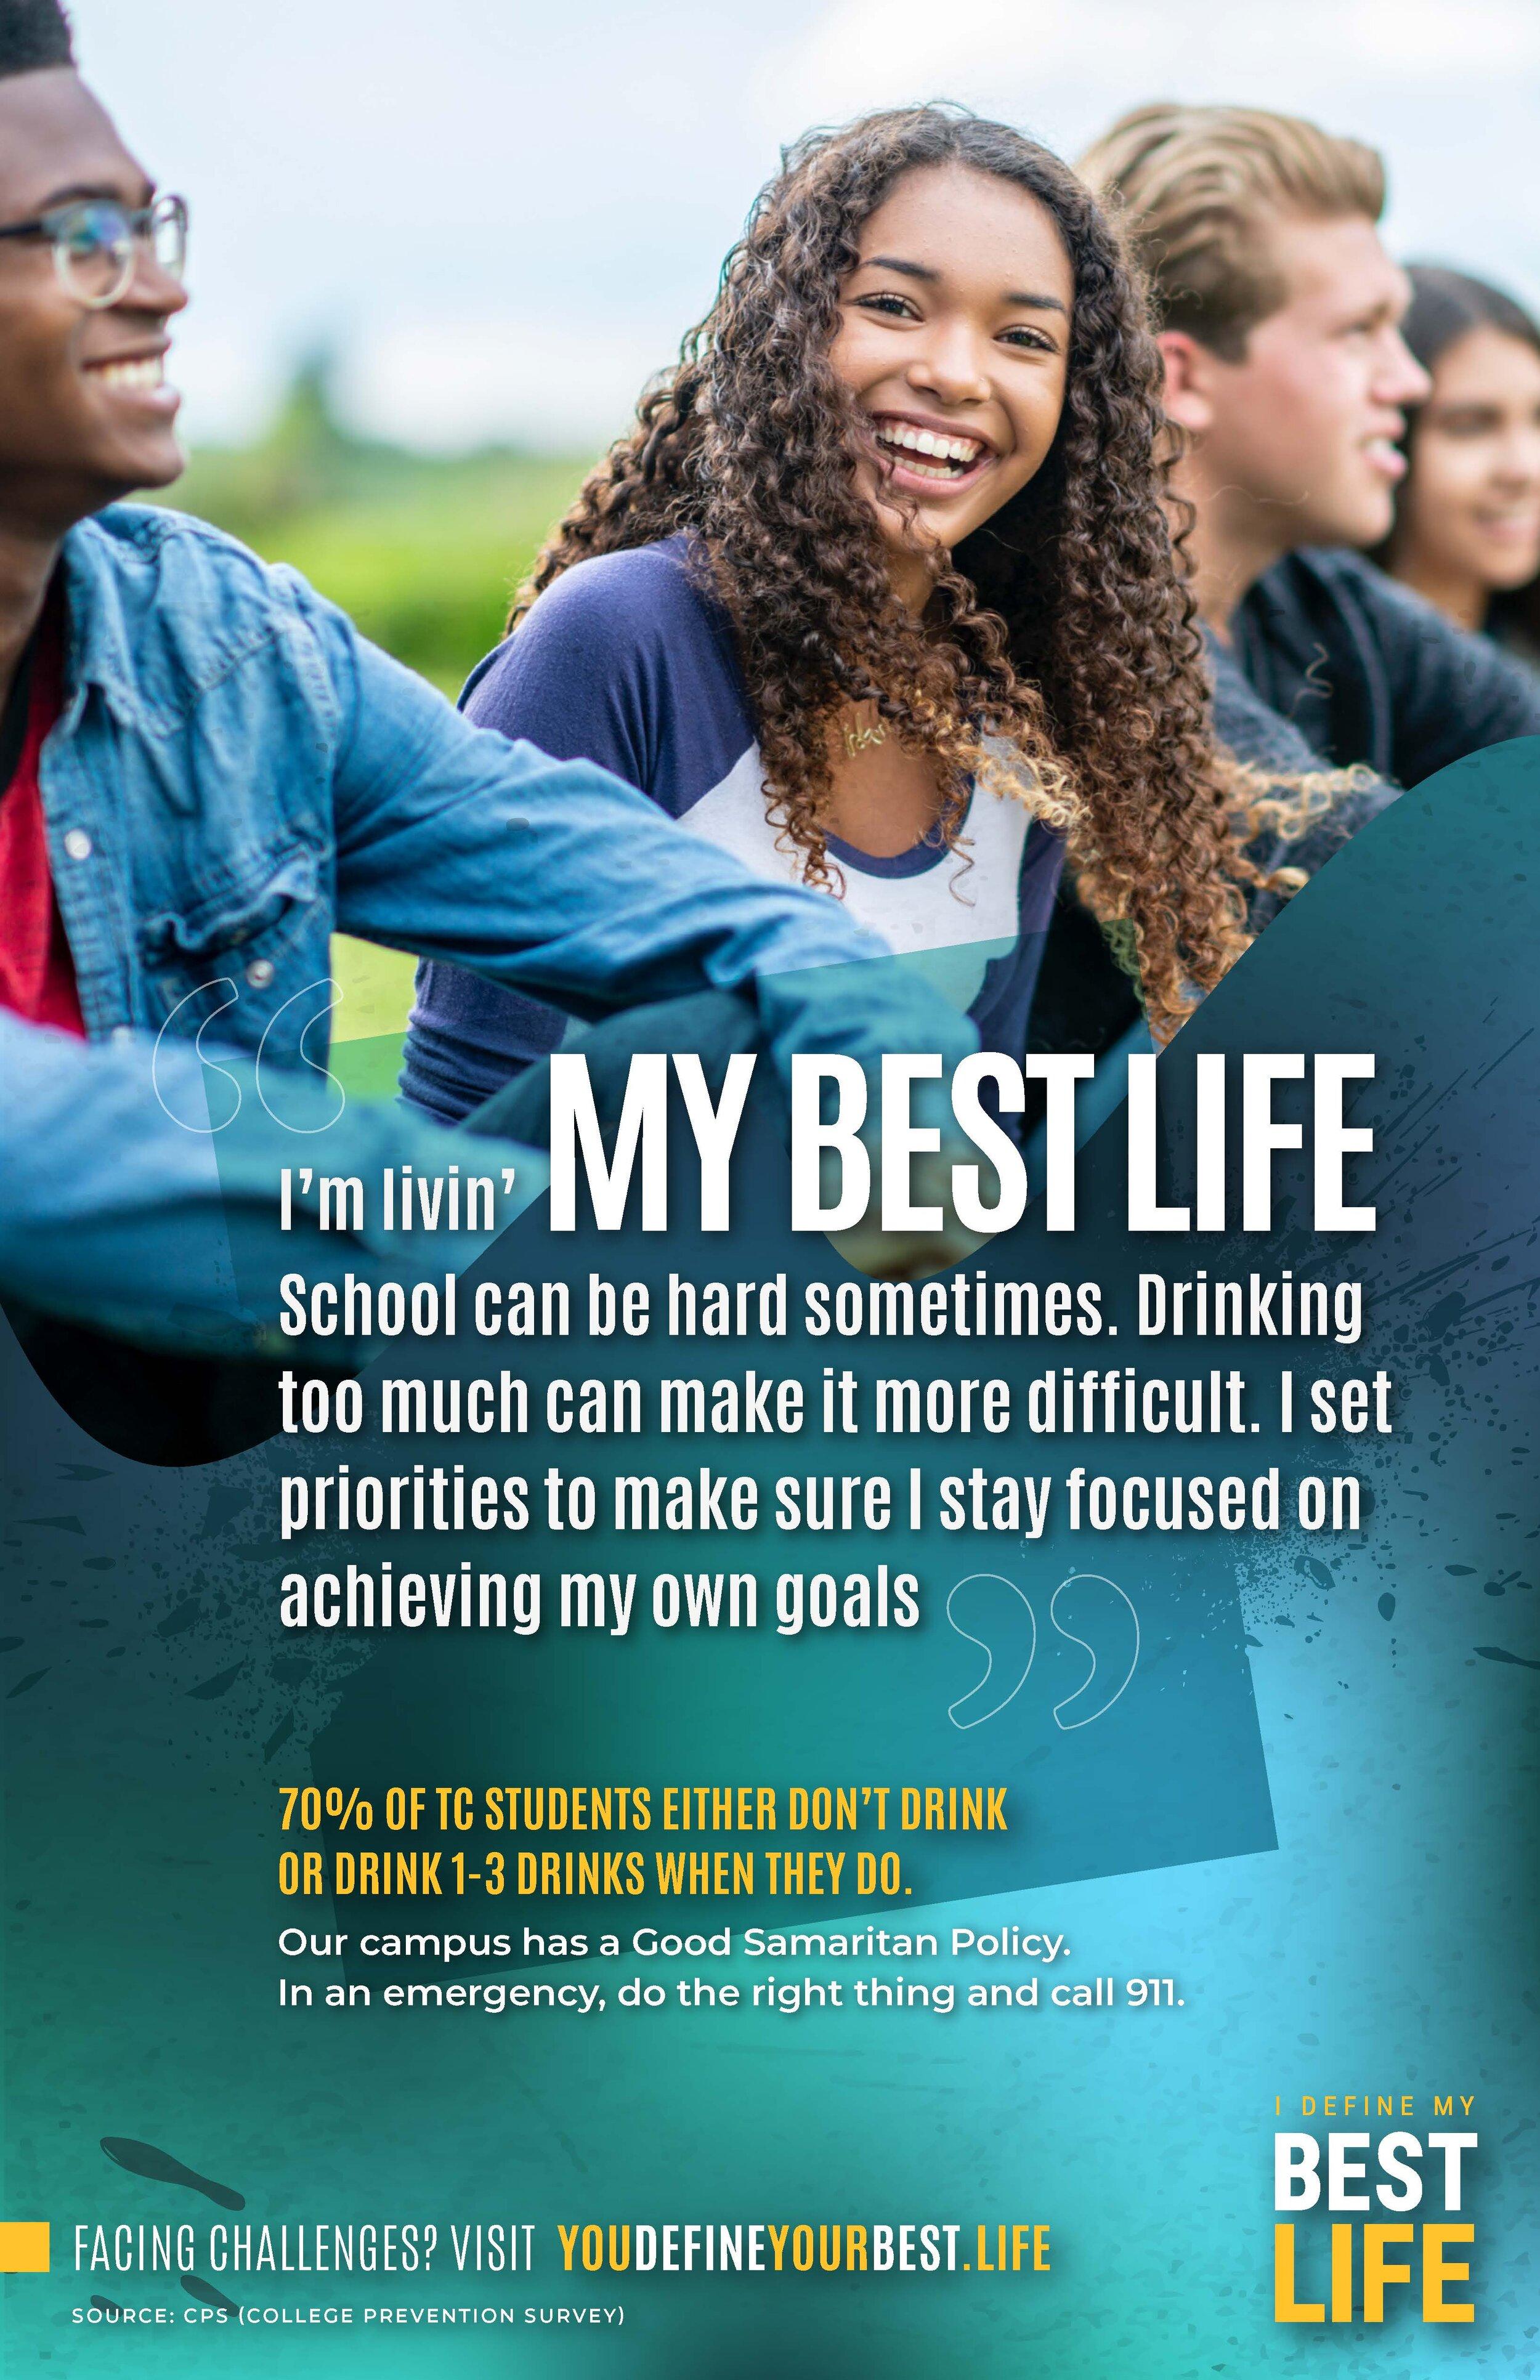 Best_Of_Life_Designs_Poster5.jpg